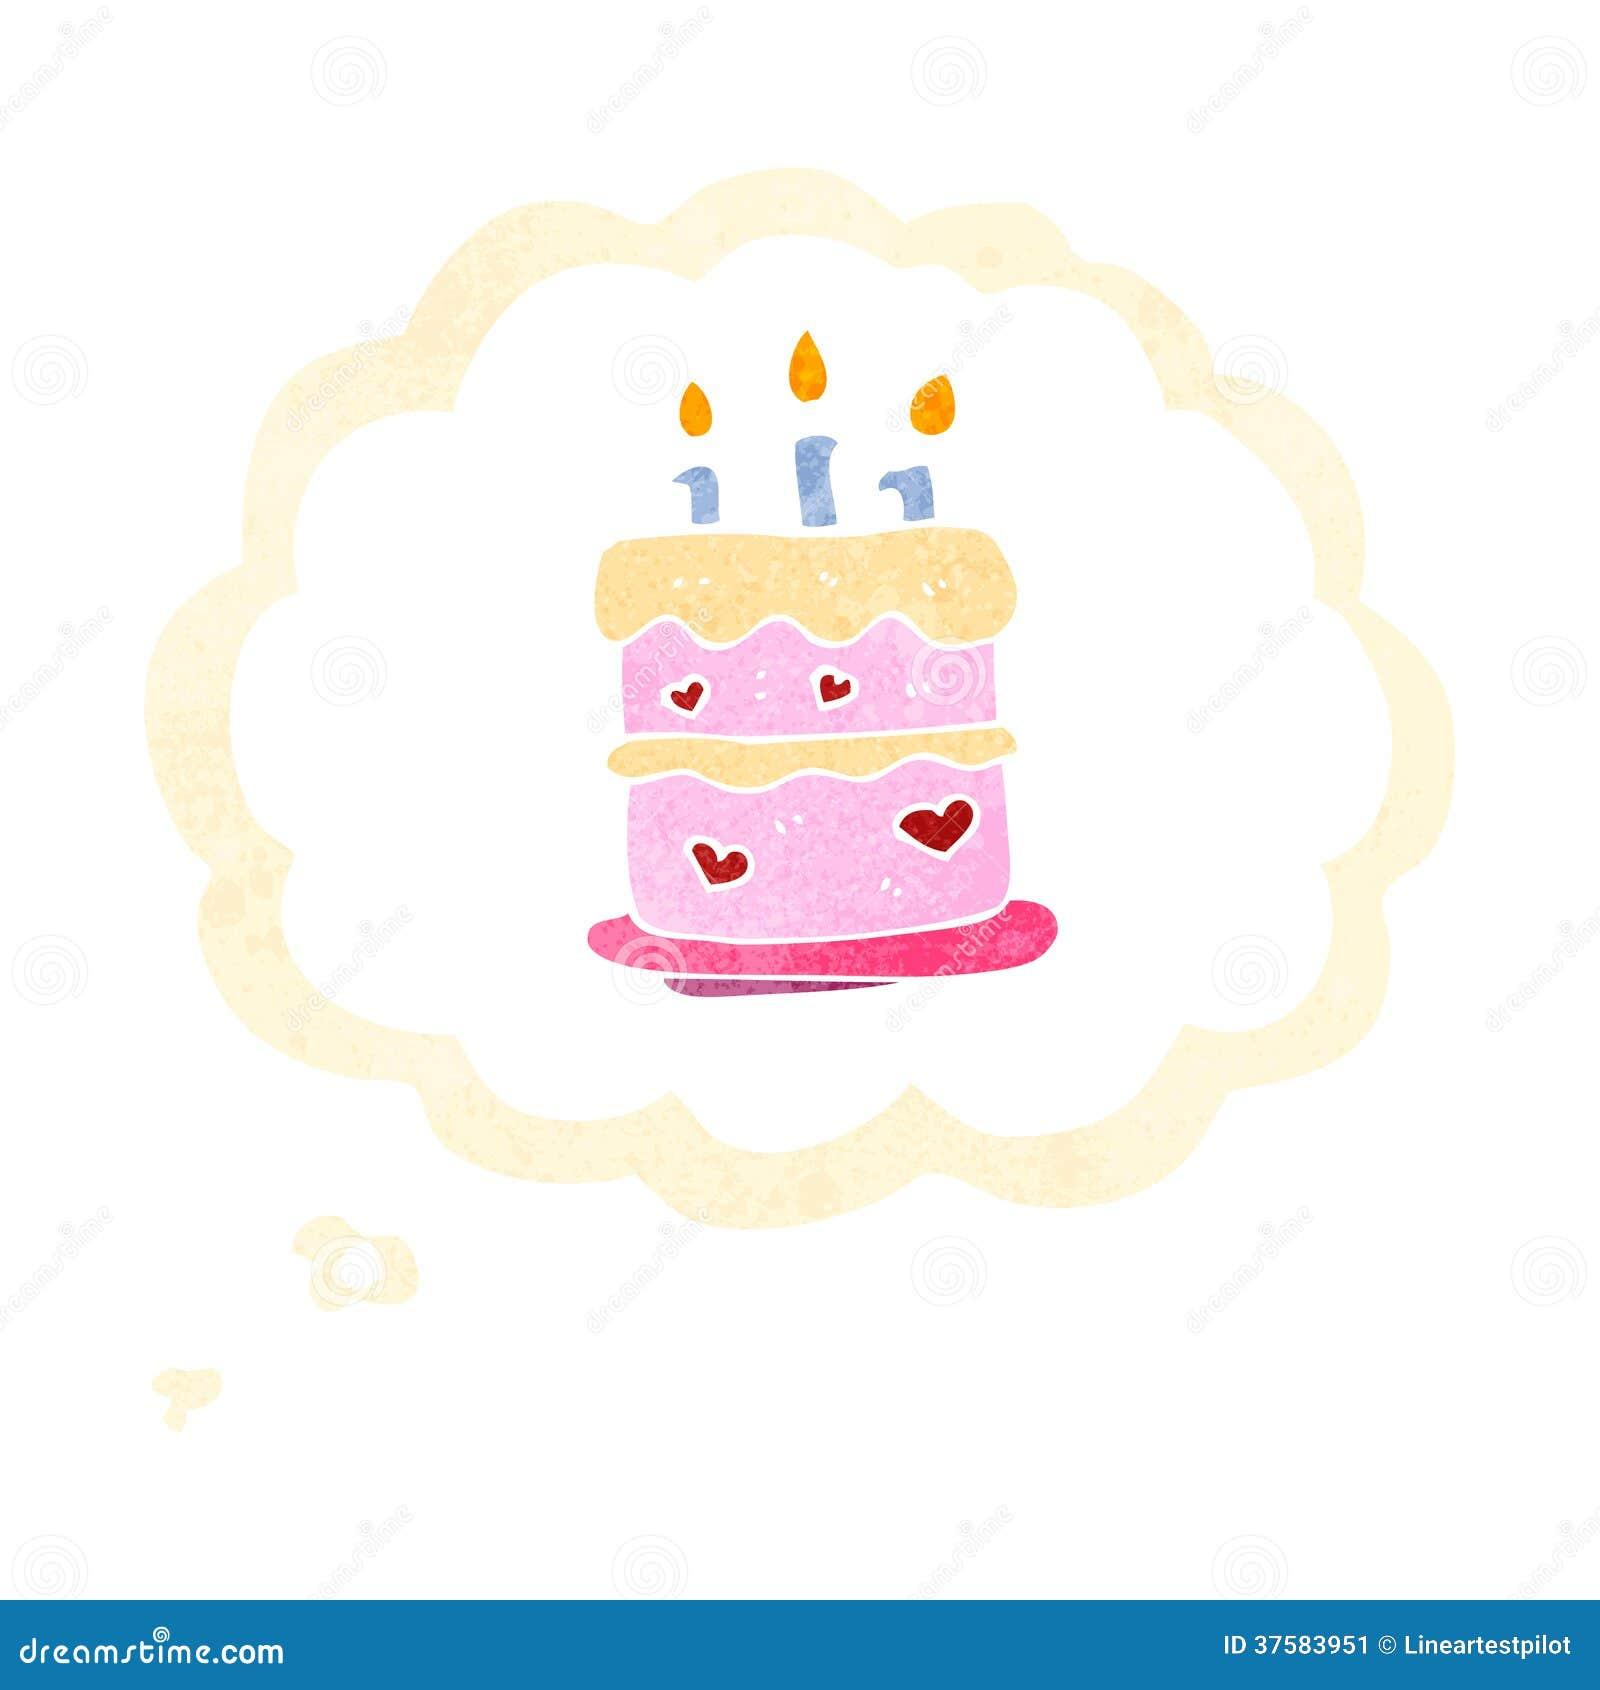 Retro cartoon birthday cake symbol stock illustration retro cartoon birthday cake symbol buycottarizona